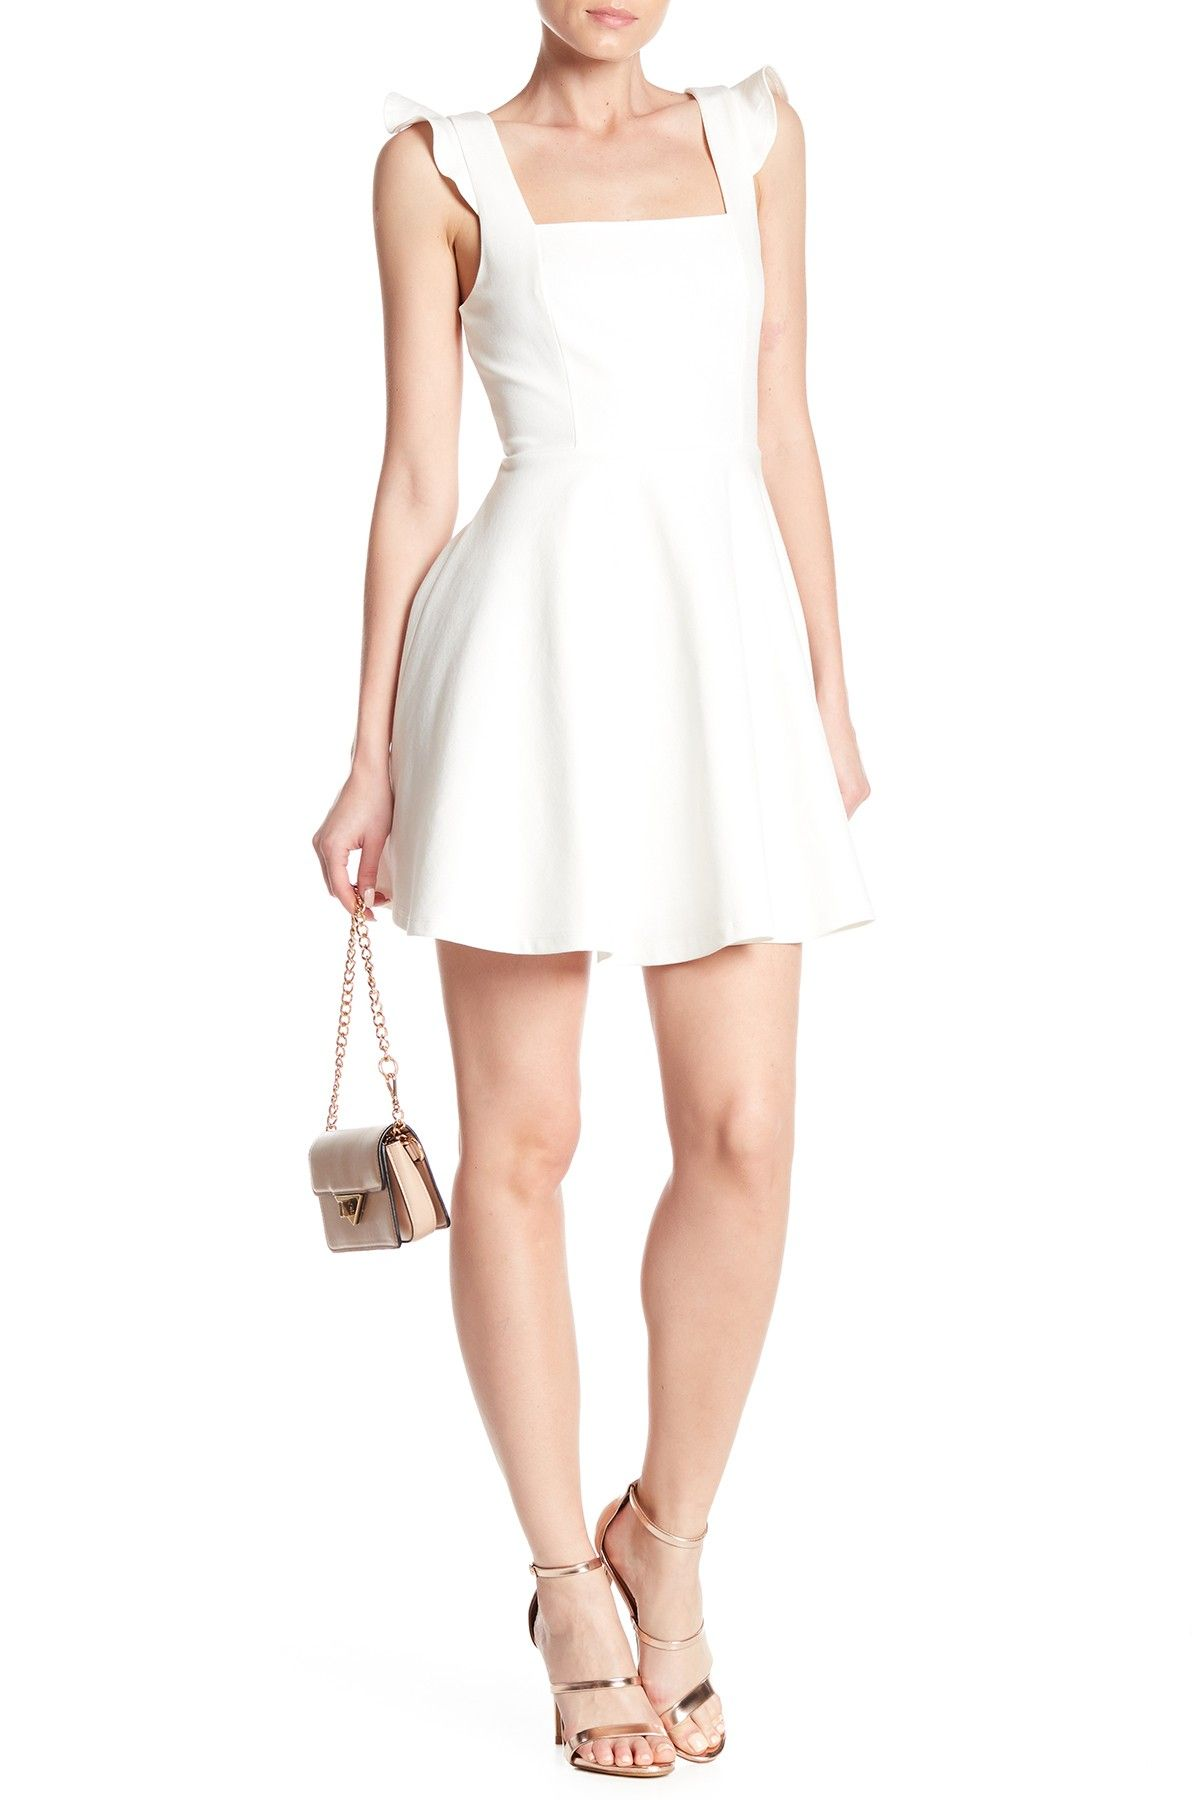 Dresses Nordstrom Rack In 2021 Lace Sheath Dress Classic Sheath Dress Dresses [ 1368 x 912 Pixel ]